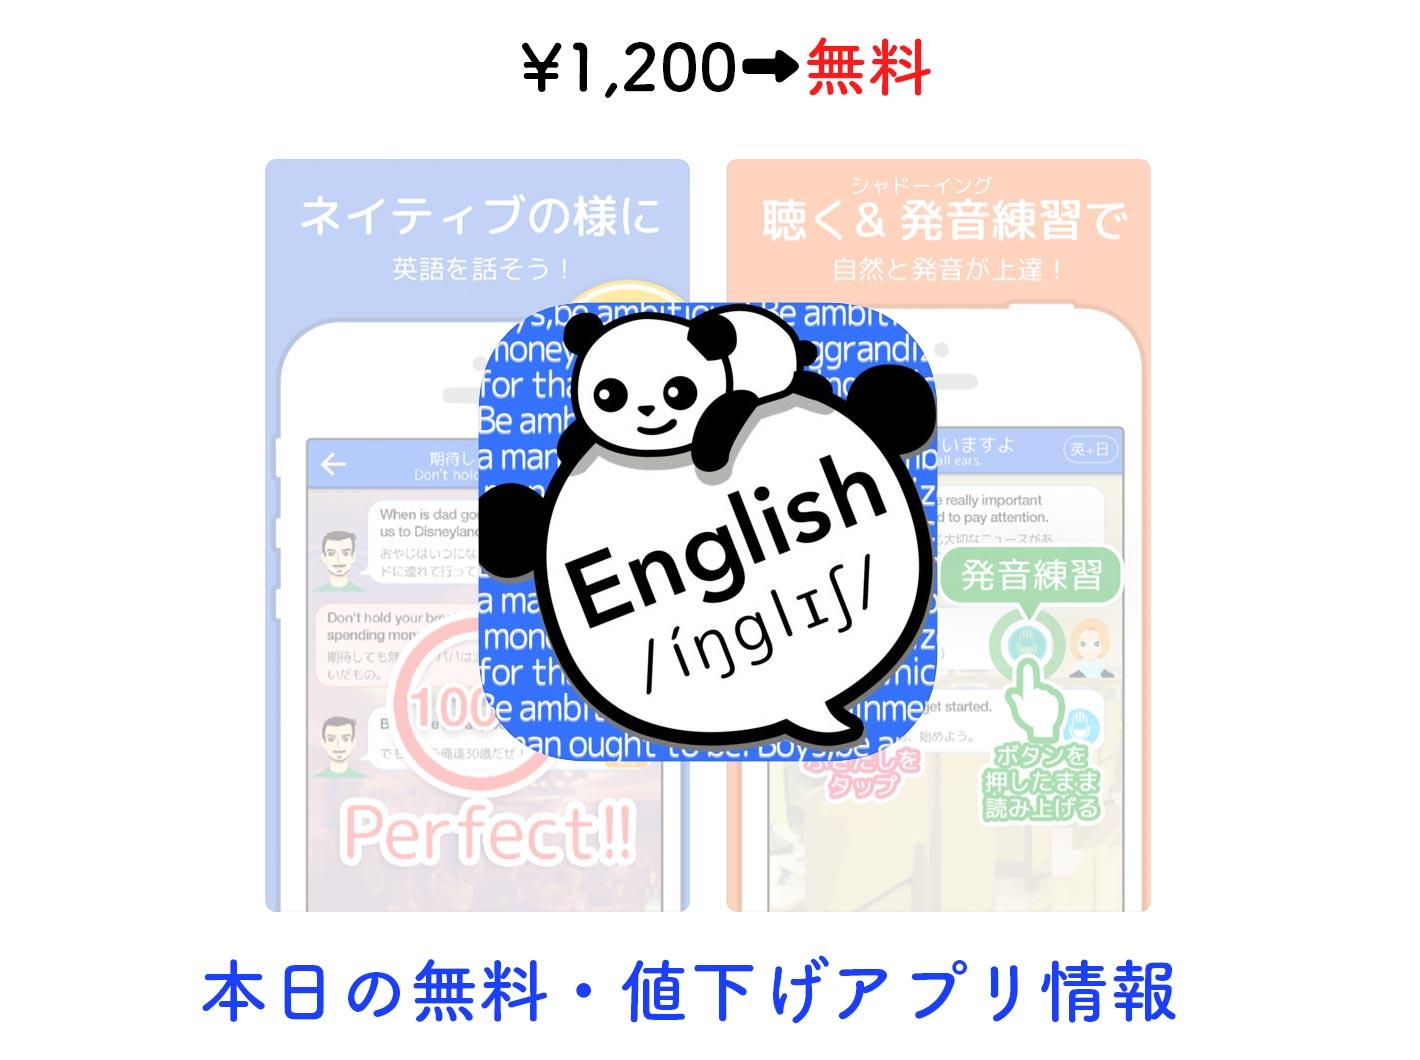 Appsale0615